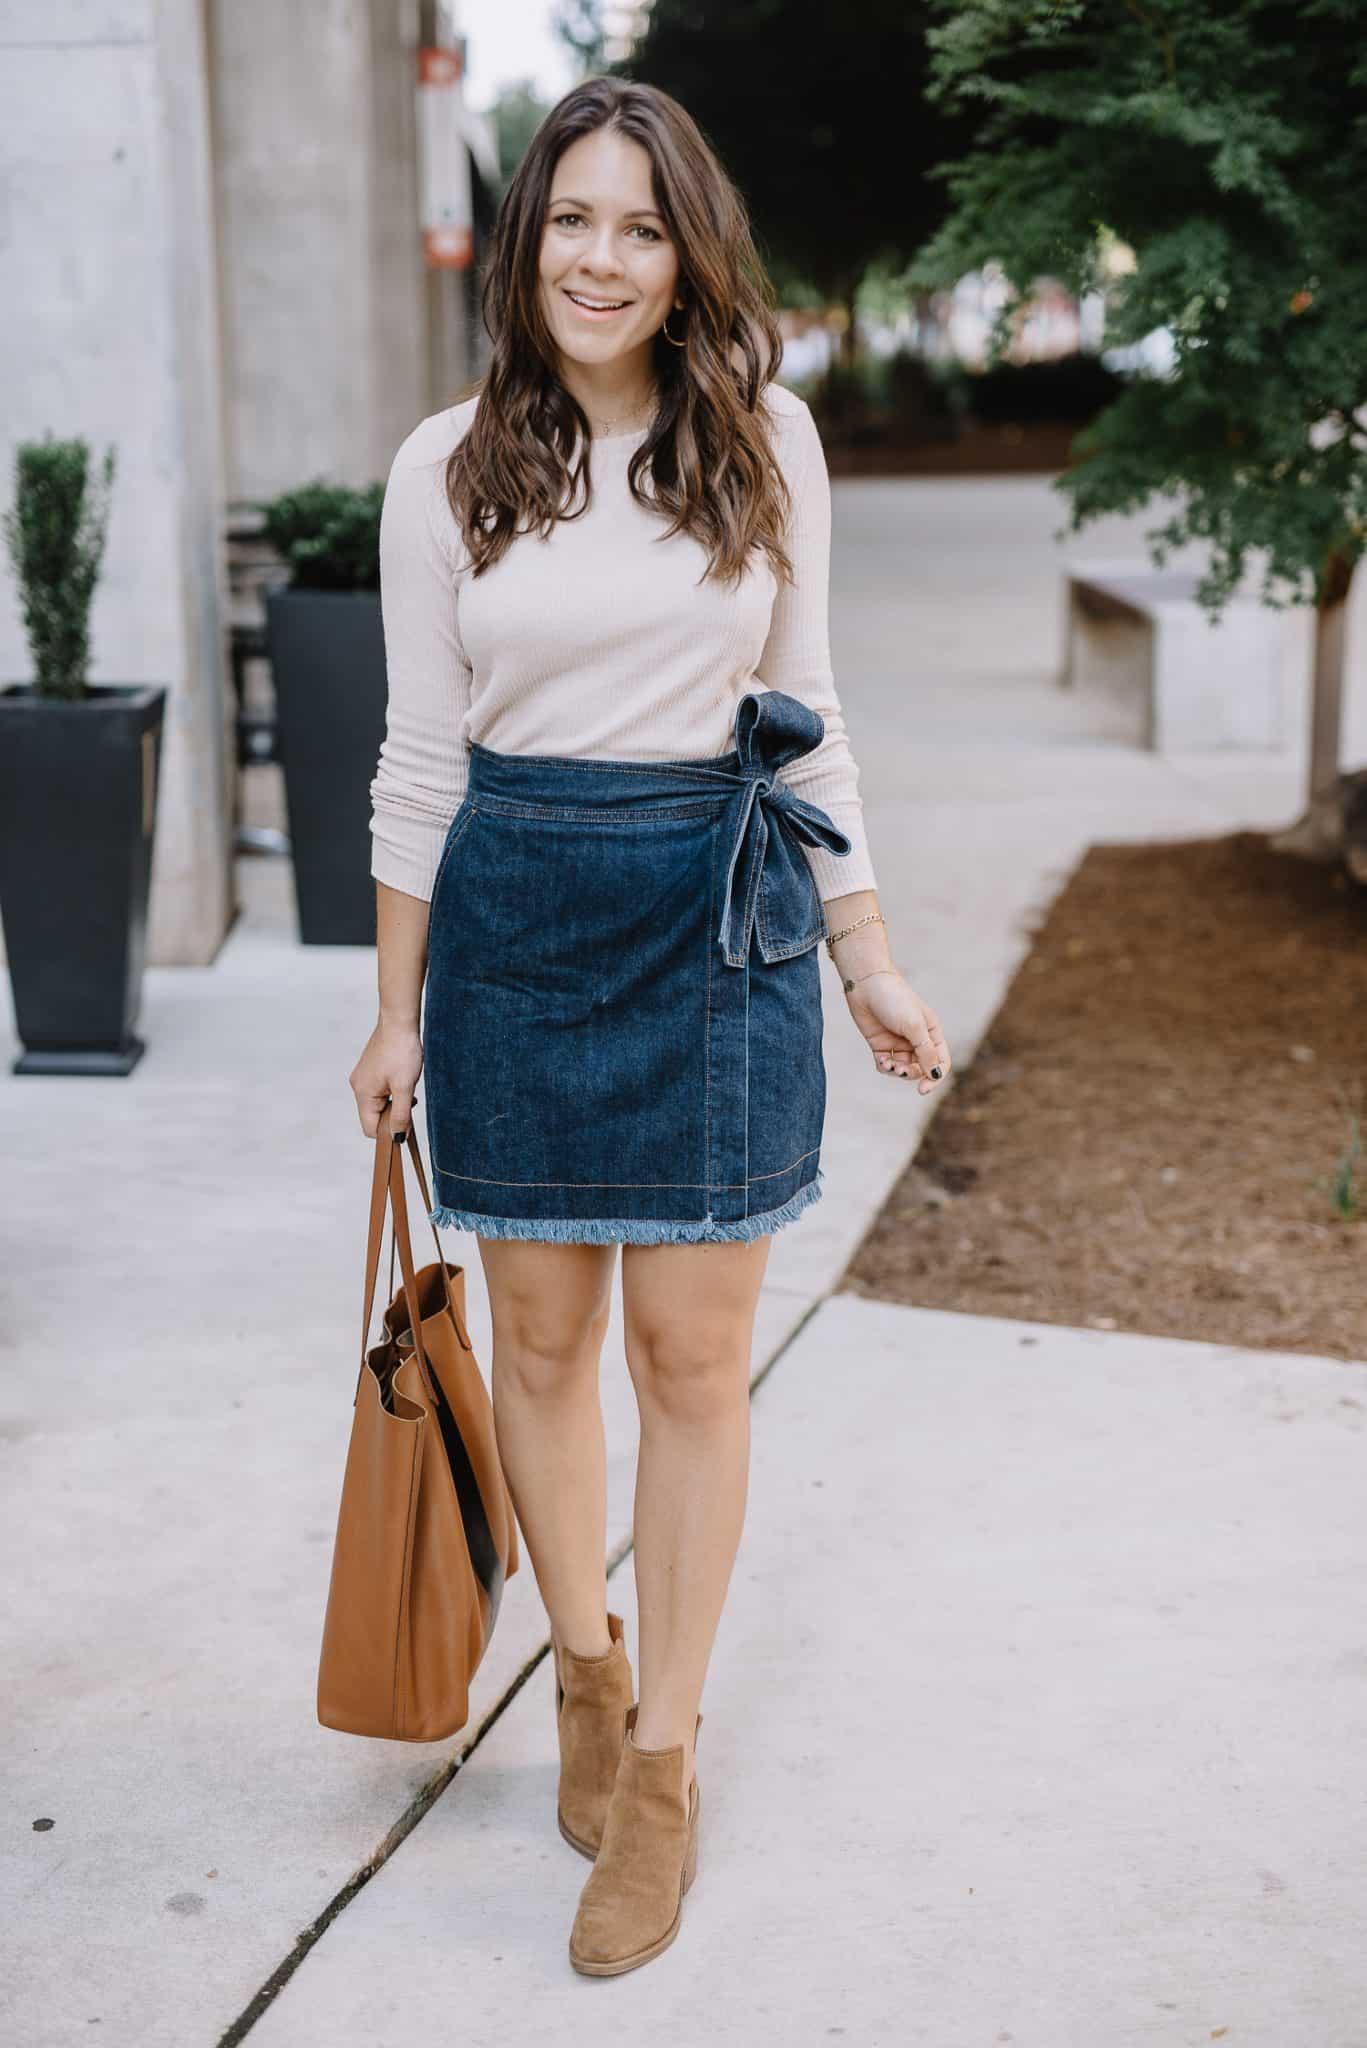 Madewell x Karen Walker Denim Skirt, how to transition your denim skirt from summer to fall - My Style Vita